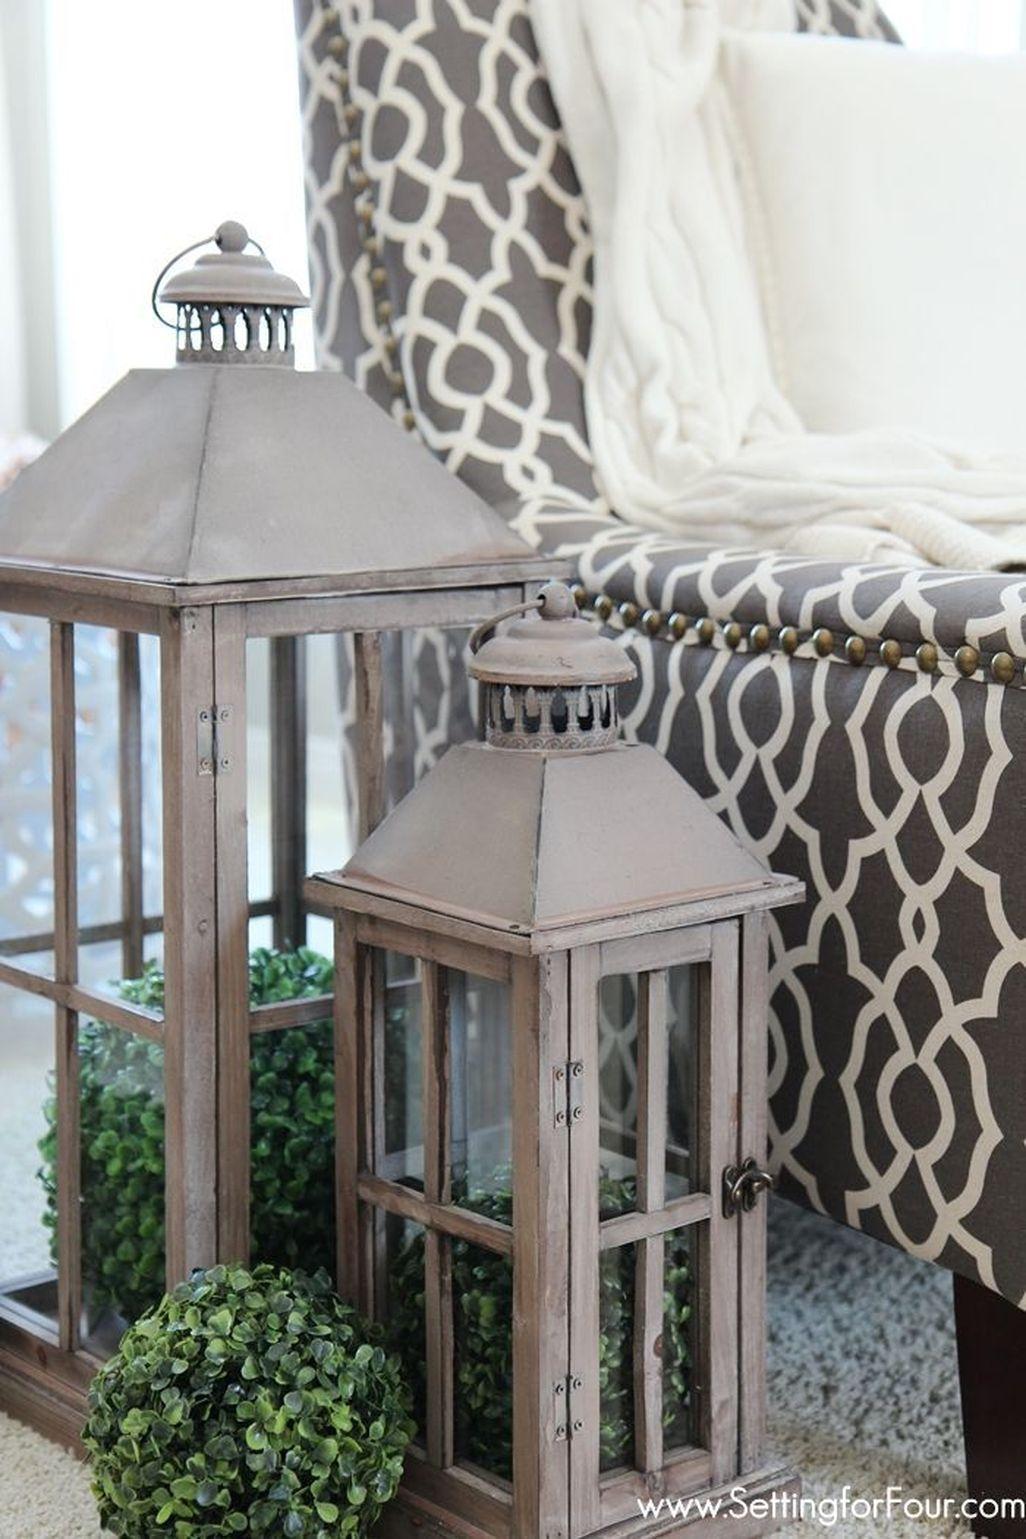 Easy Diy Spring And Summer Home Decor Ideas 17